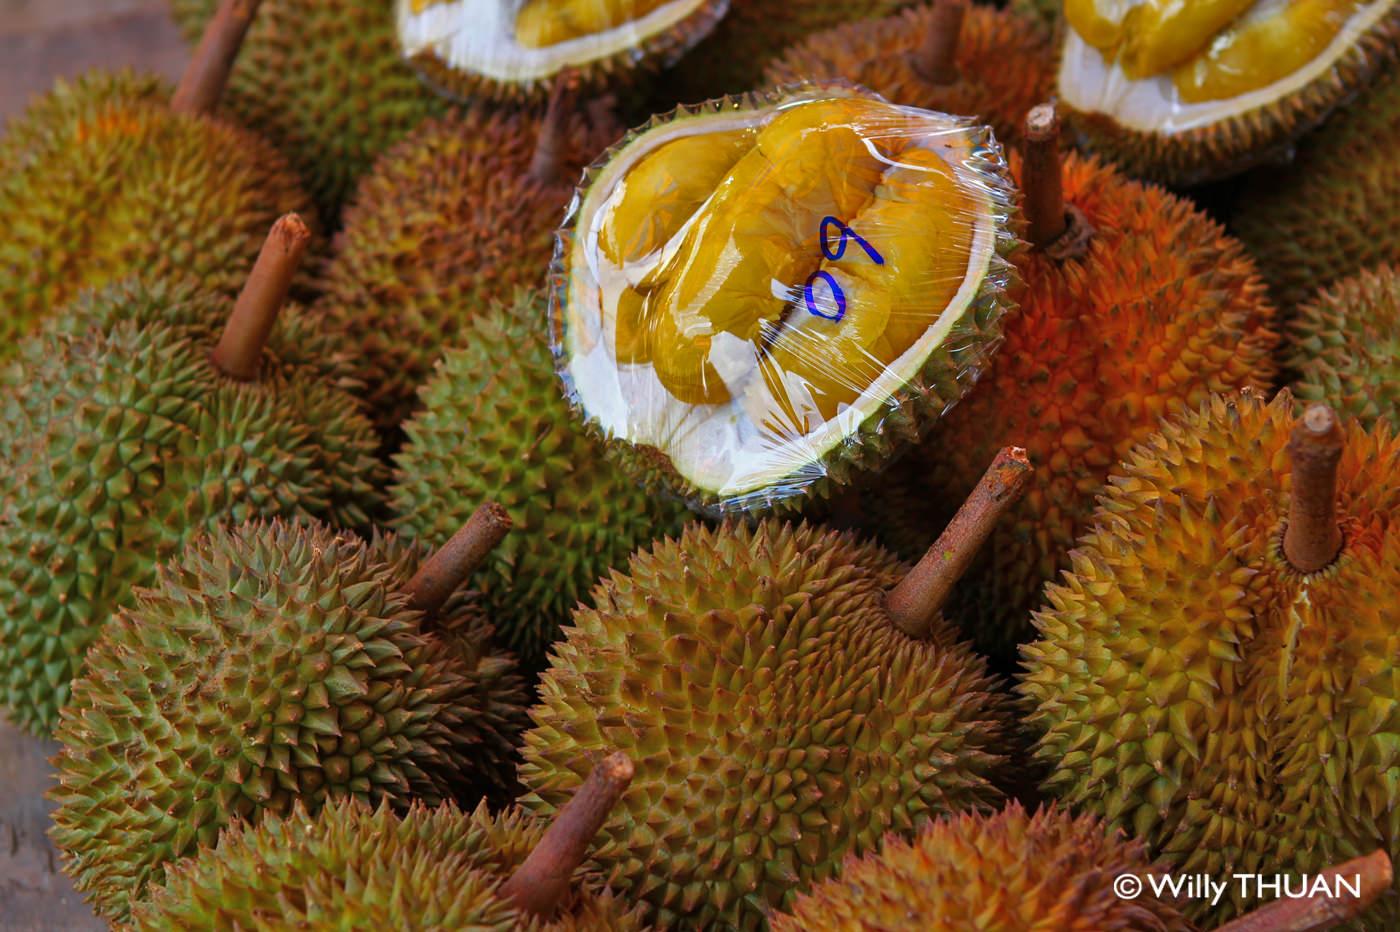 25 Thai Fruits to Discover in Phuket - Phuket 101 2d7e129ebb